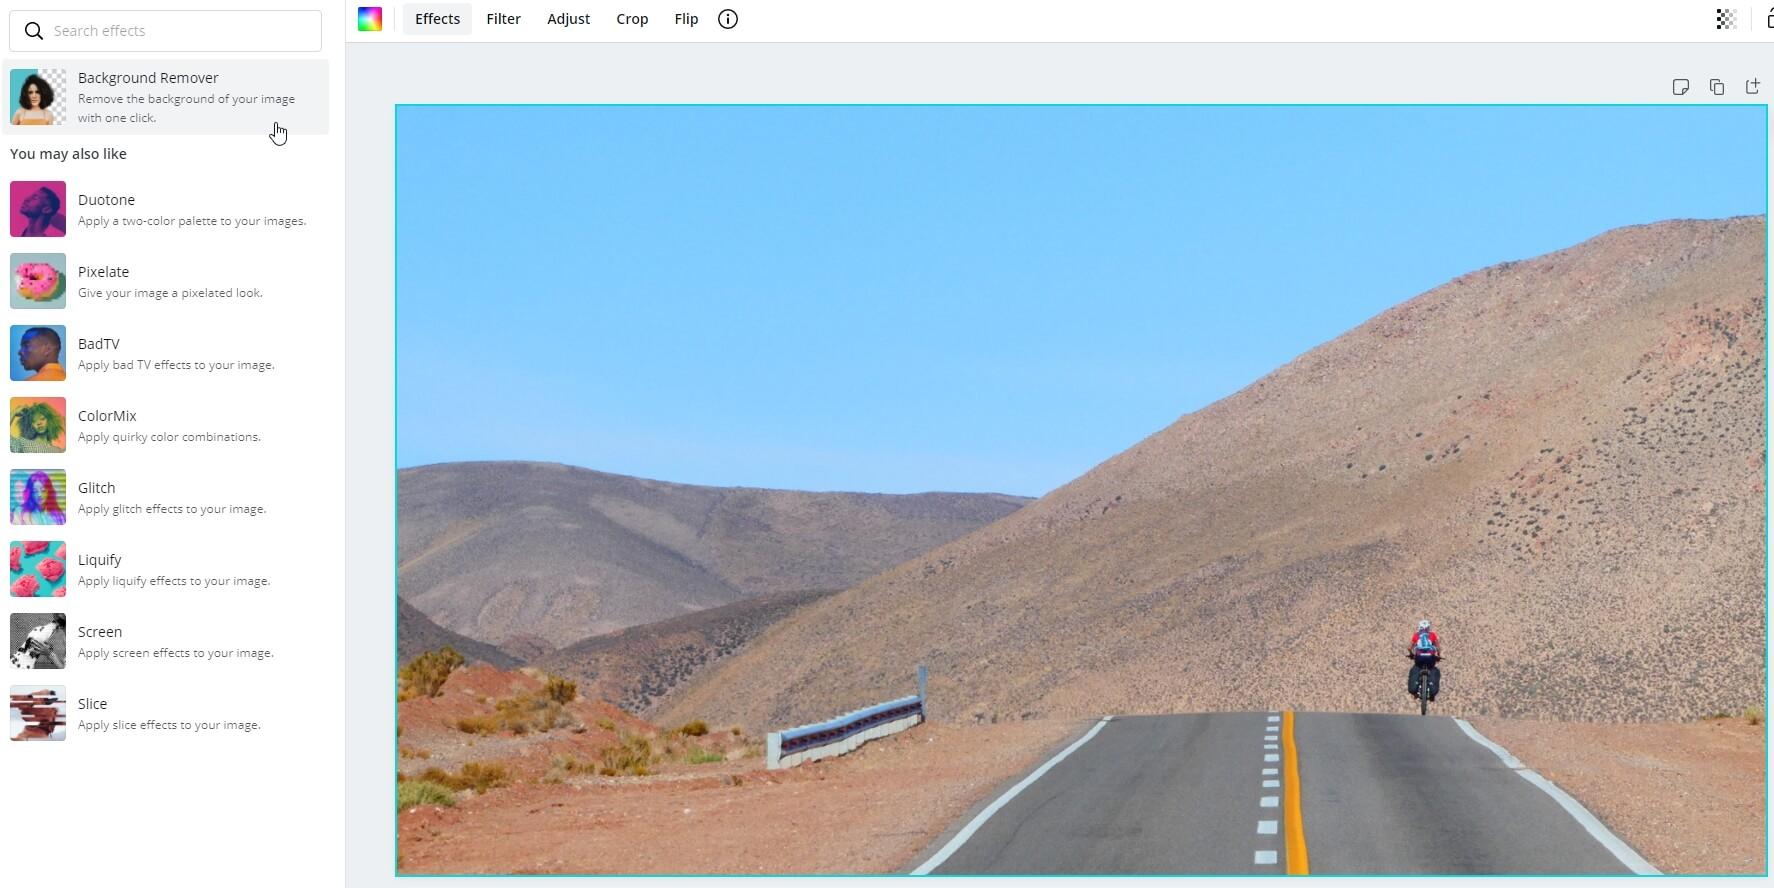 Schermafdruk achtergrond verwijderen in Canva